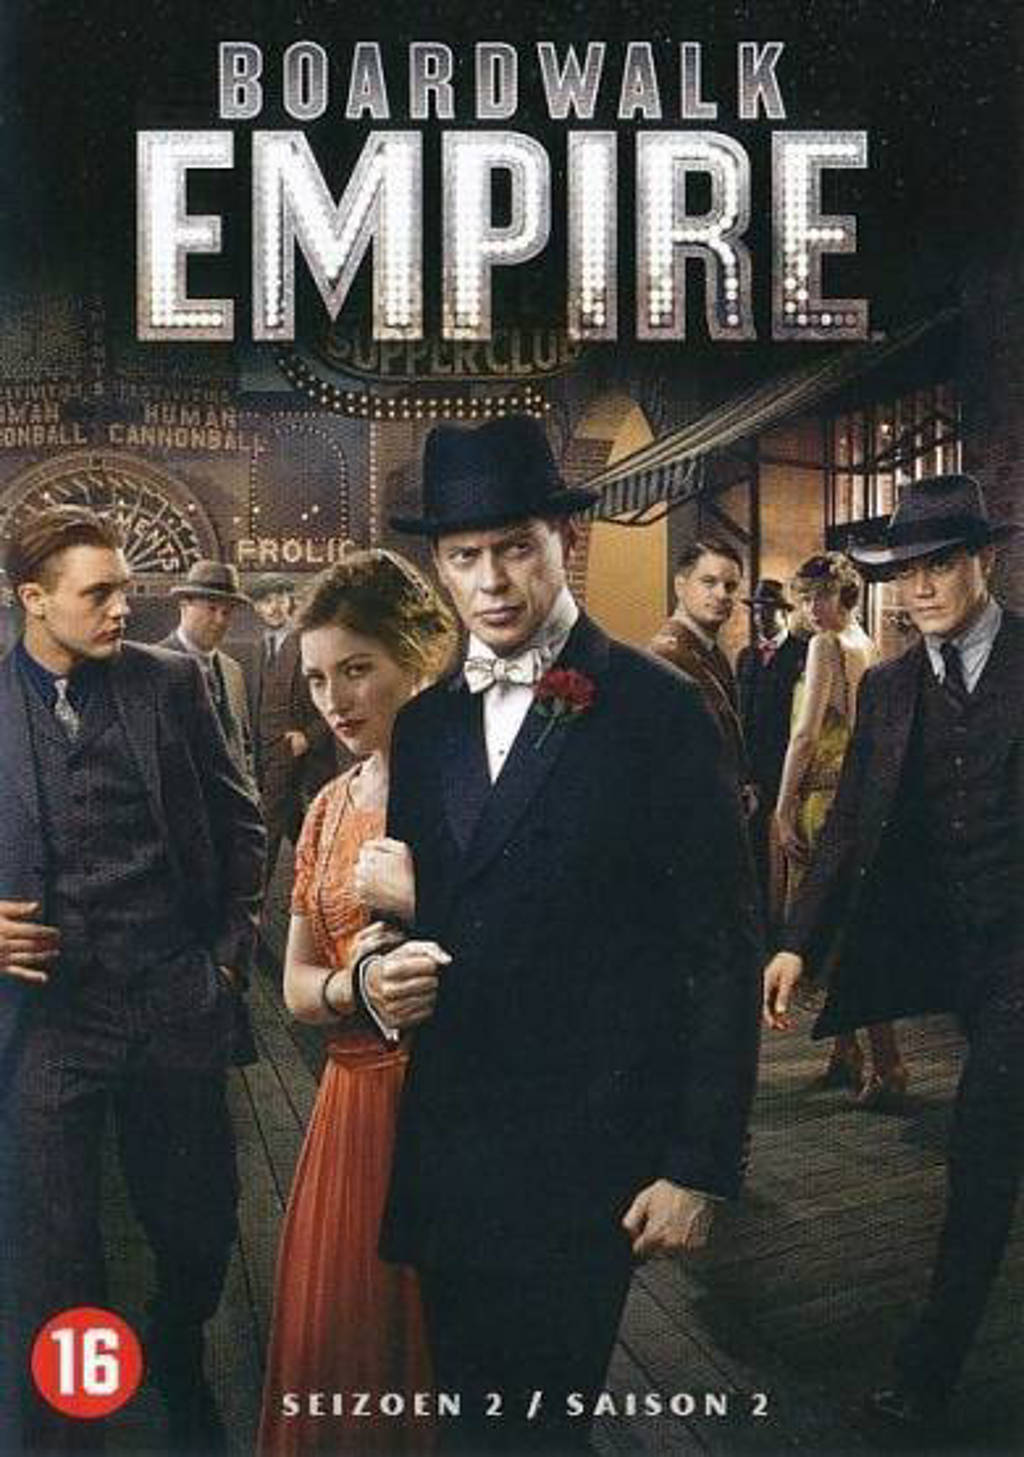 Boardwalk empire - Seizoen 2 (DVD)